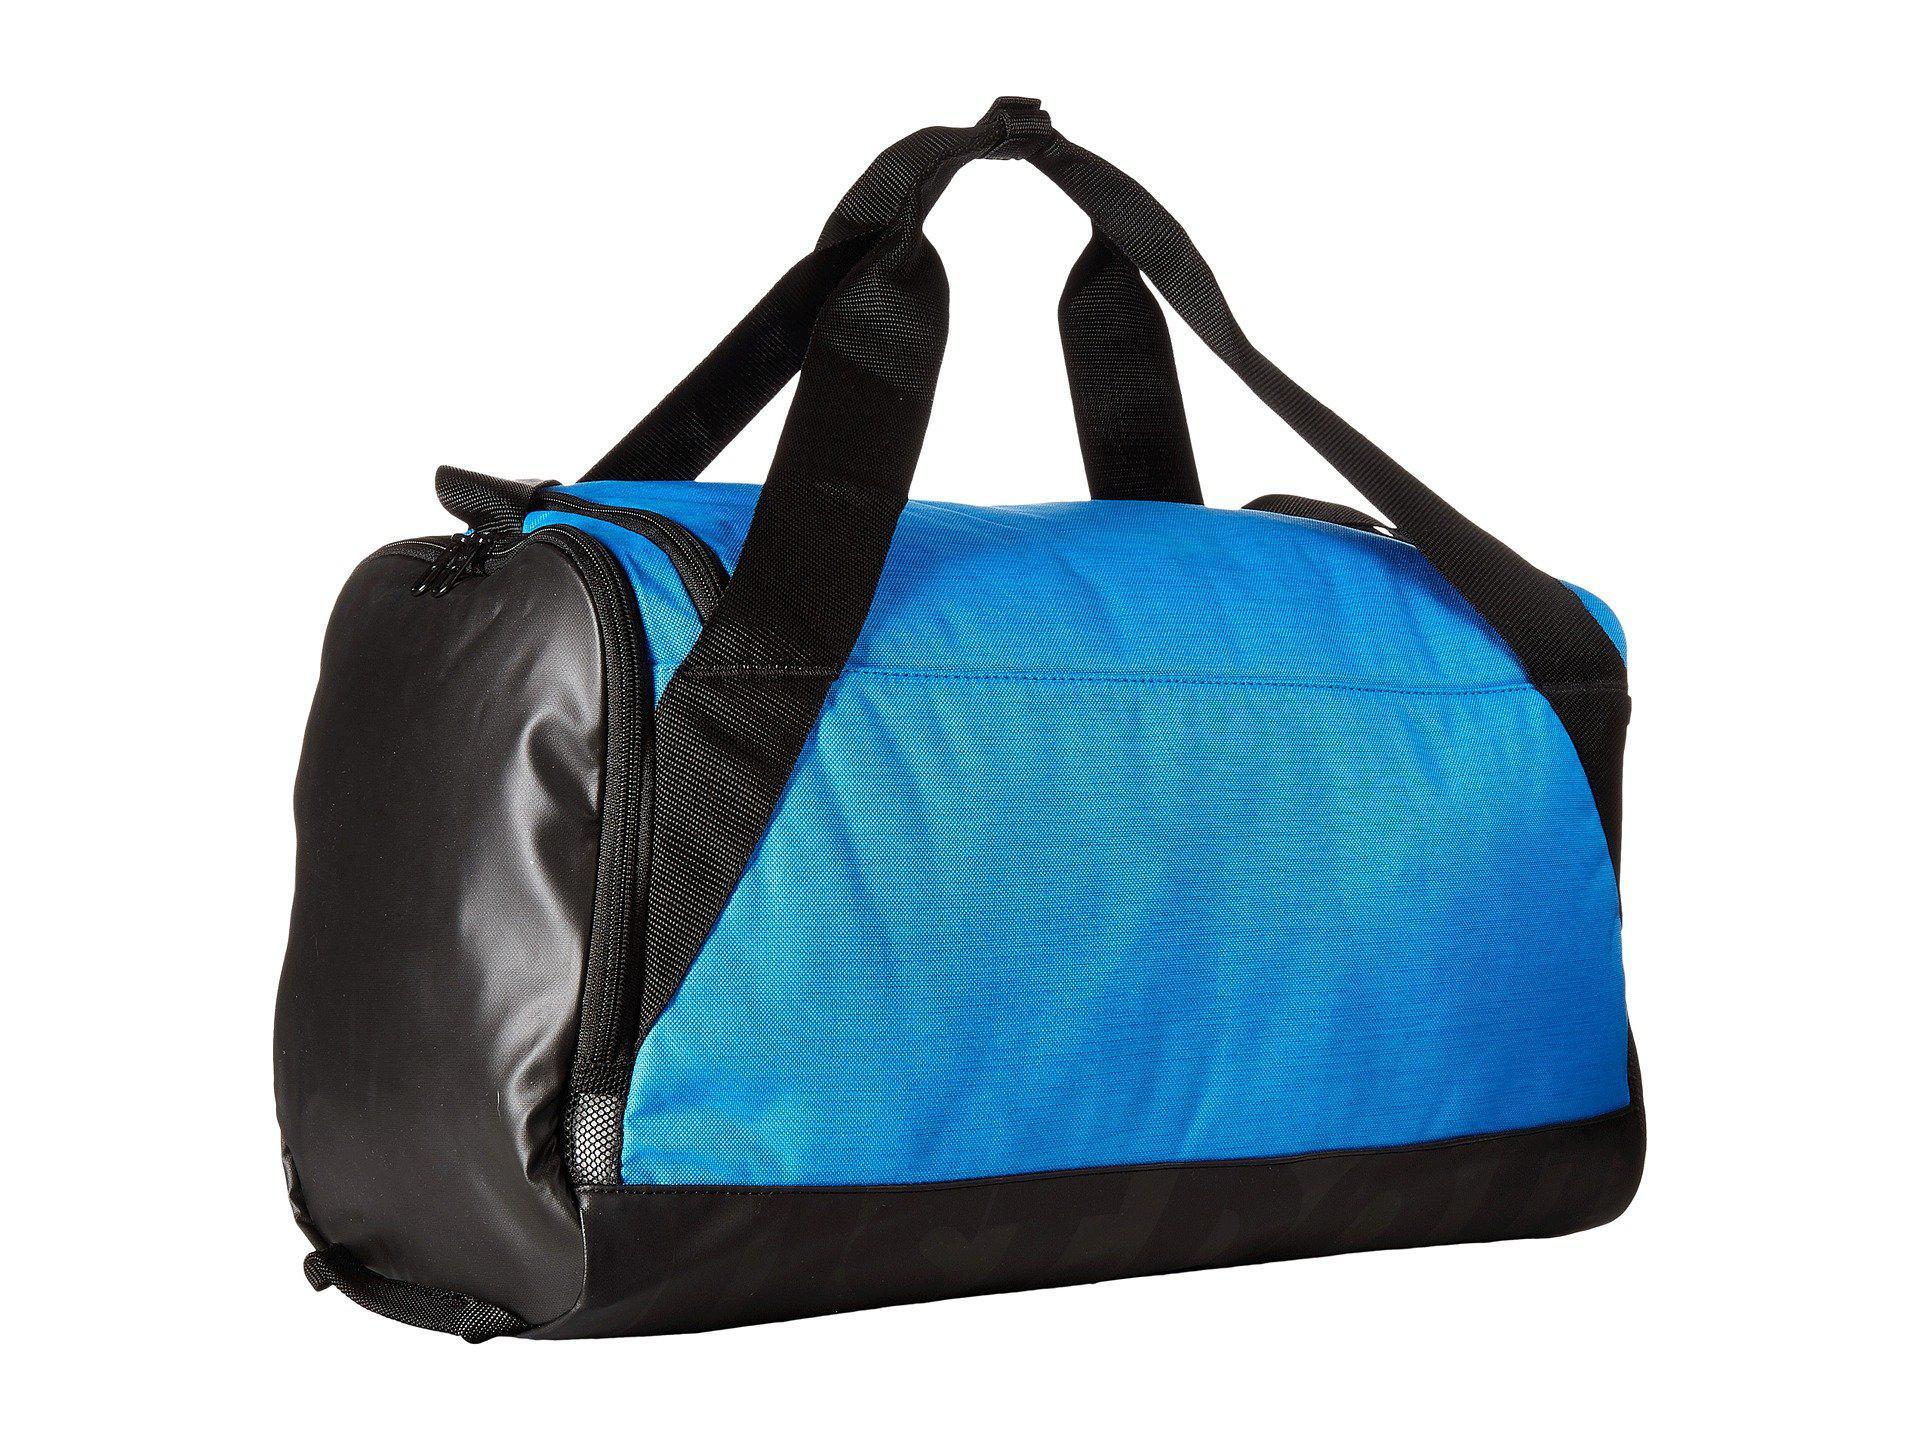 b6b4f88db791 Mens Nike Alpha Small Training Duffel Bag